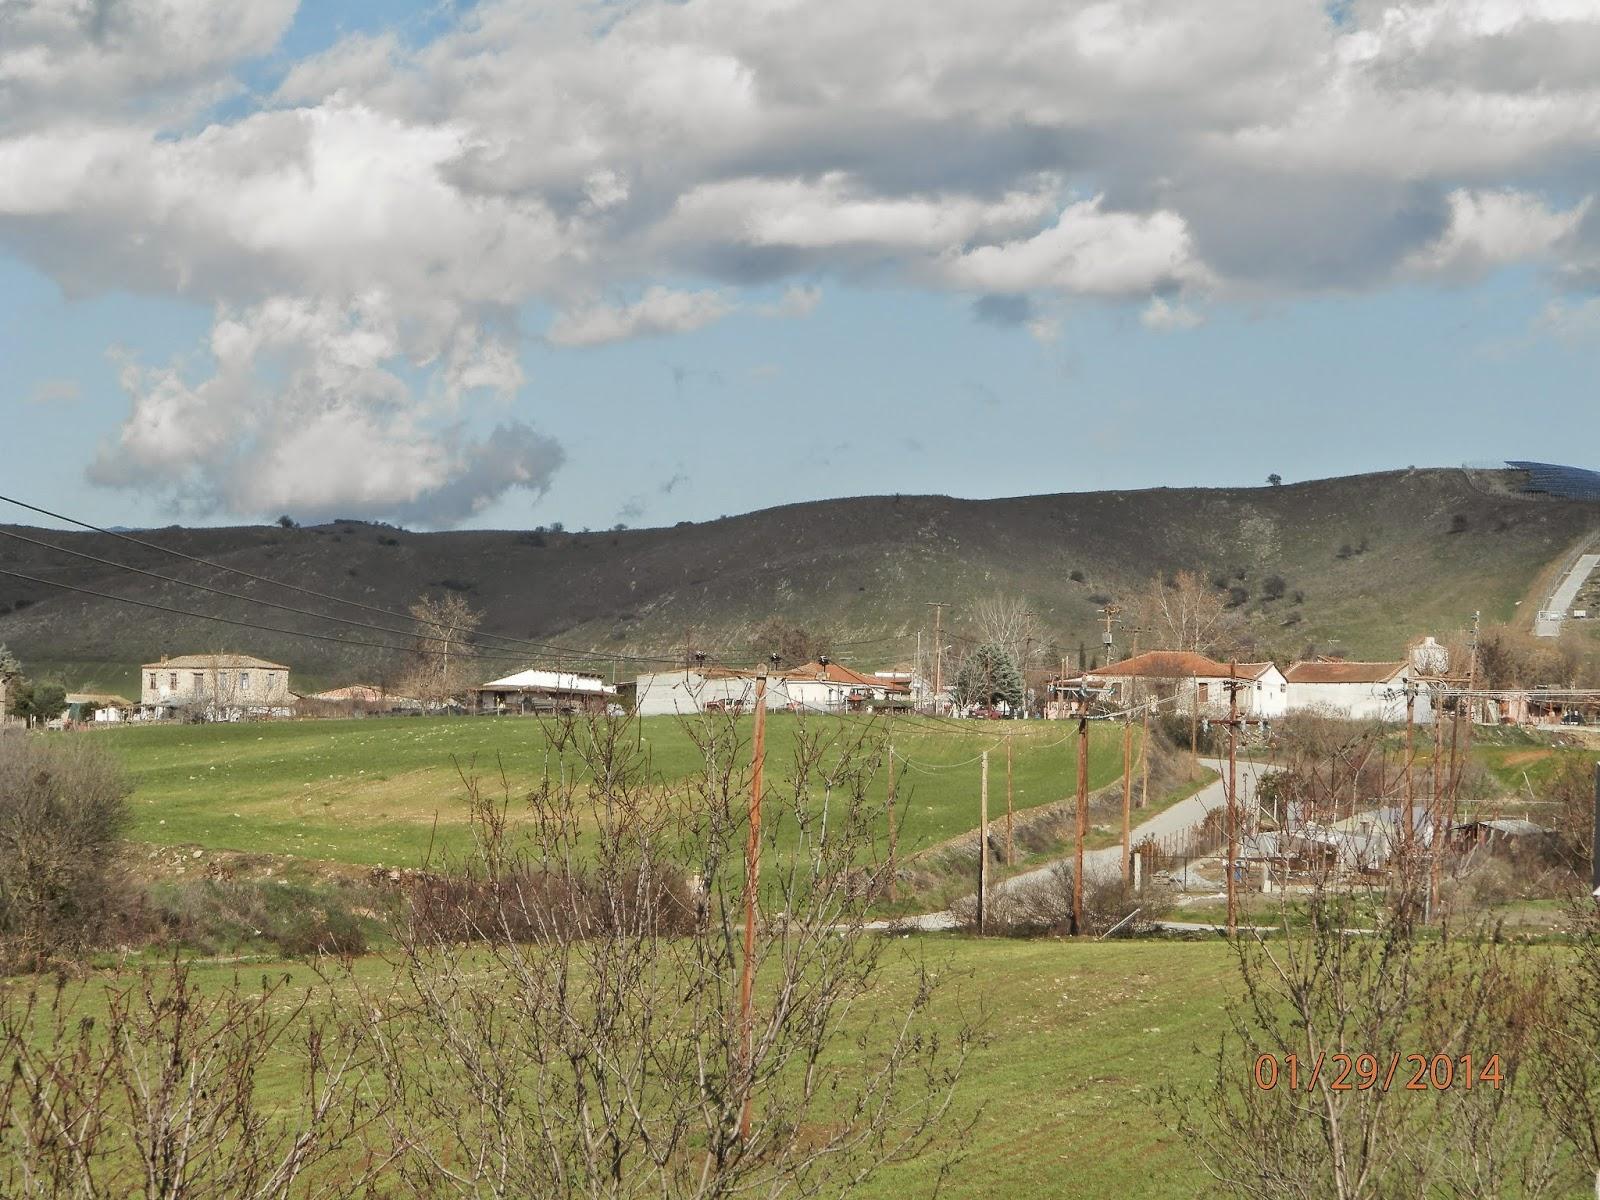 P1290214 - Αφιέρωμα στο μικρό χωριό του δήμου Τυρνάβου